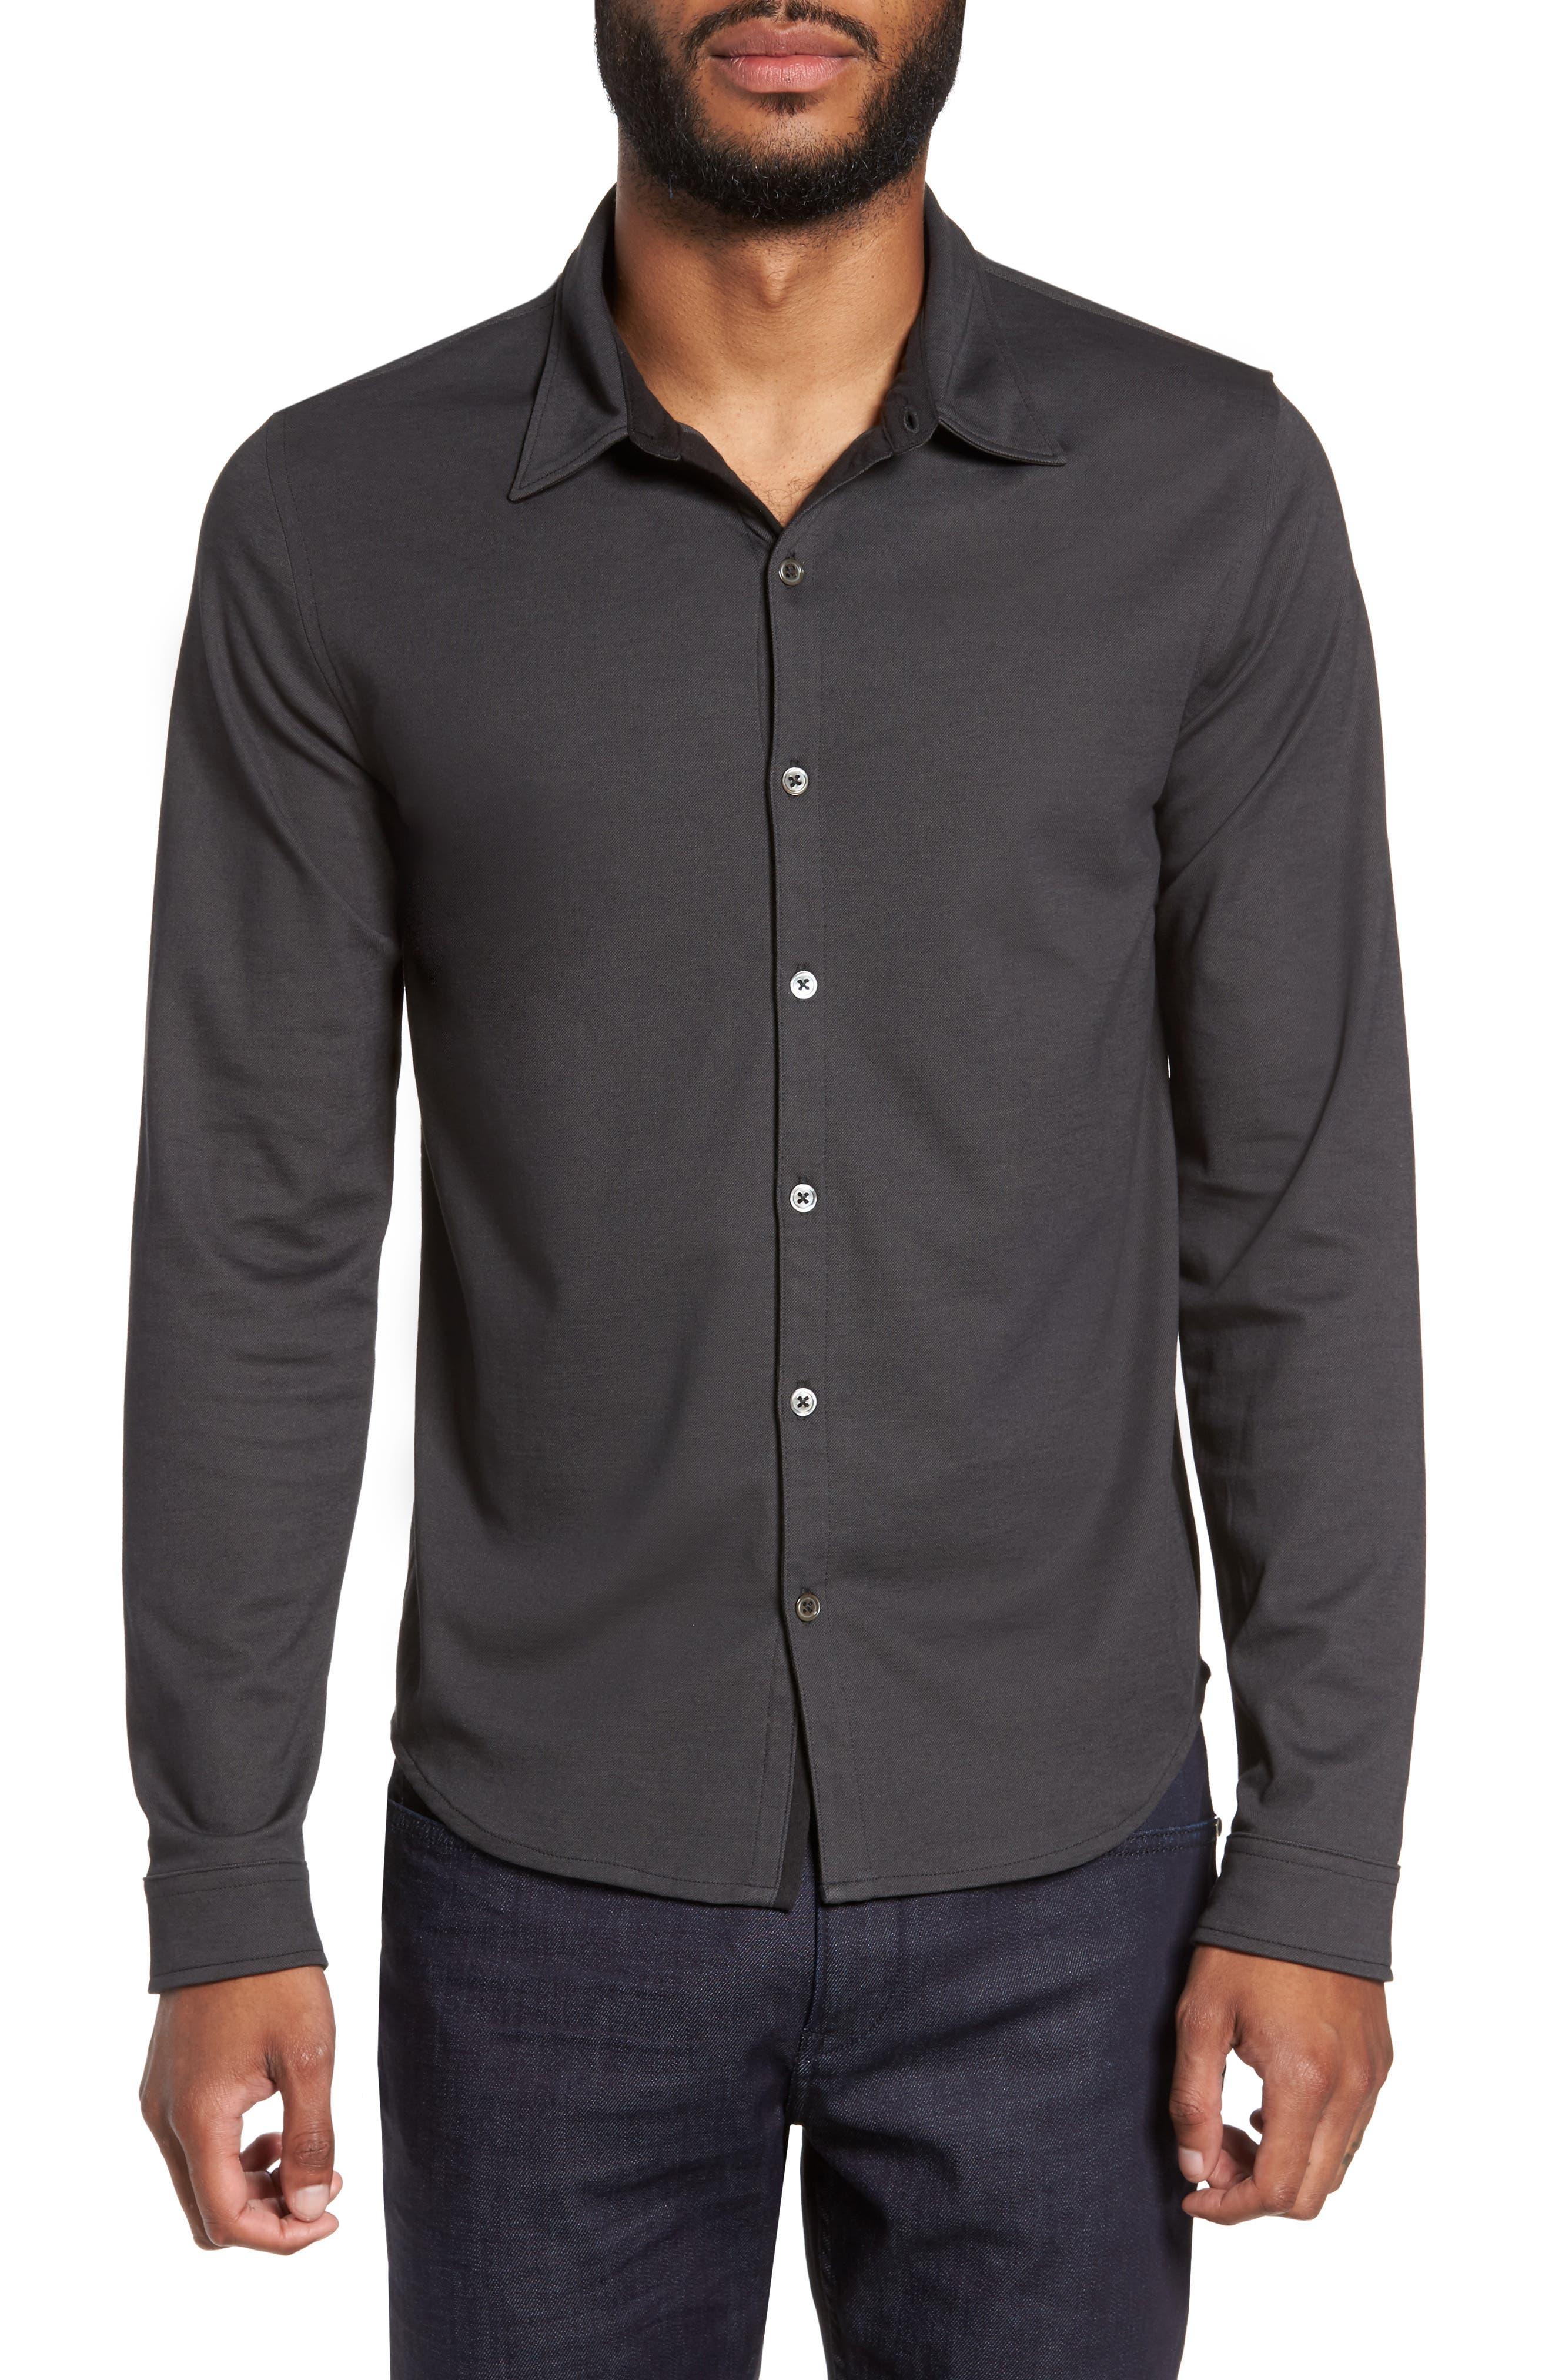 Glacier Knit Sport Shirt,                             Main thumbnail 1, color,                             Black